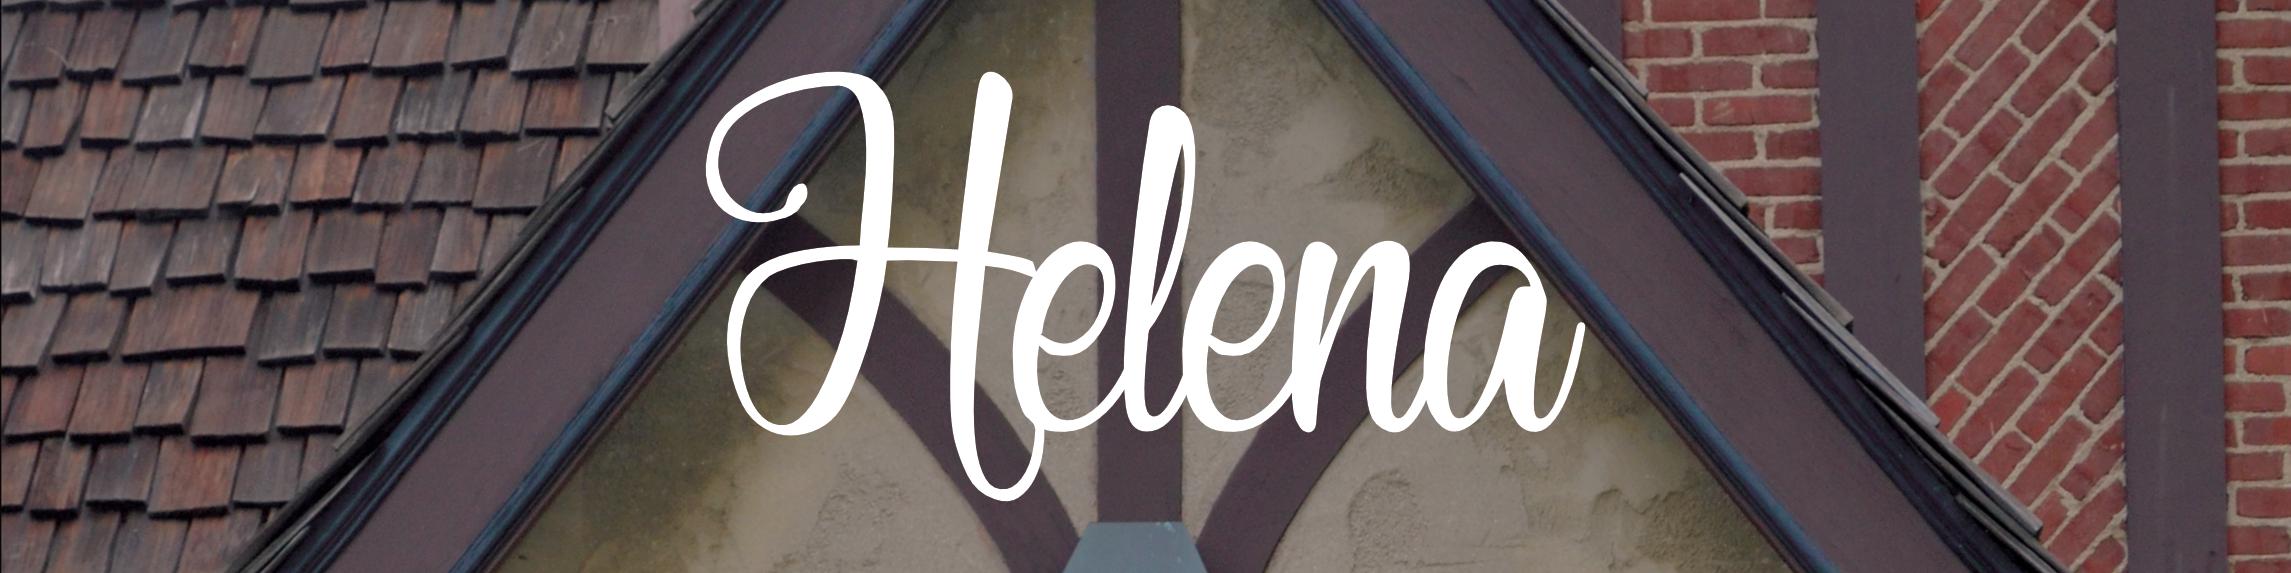 Luxury homes for sale in Helena al